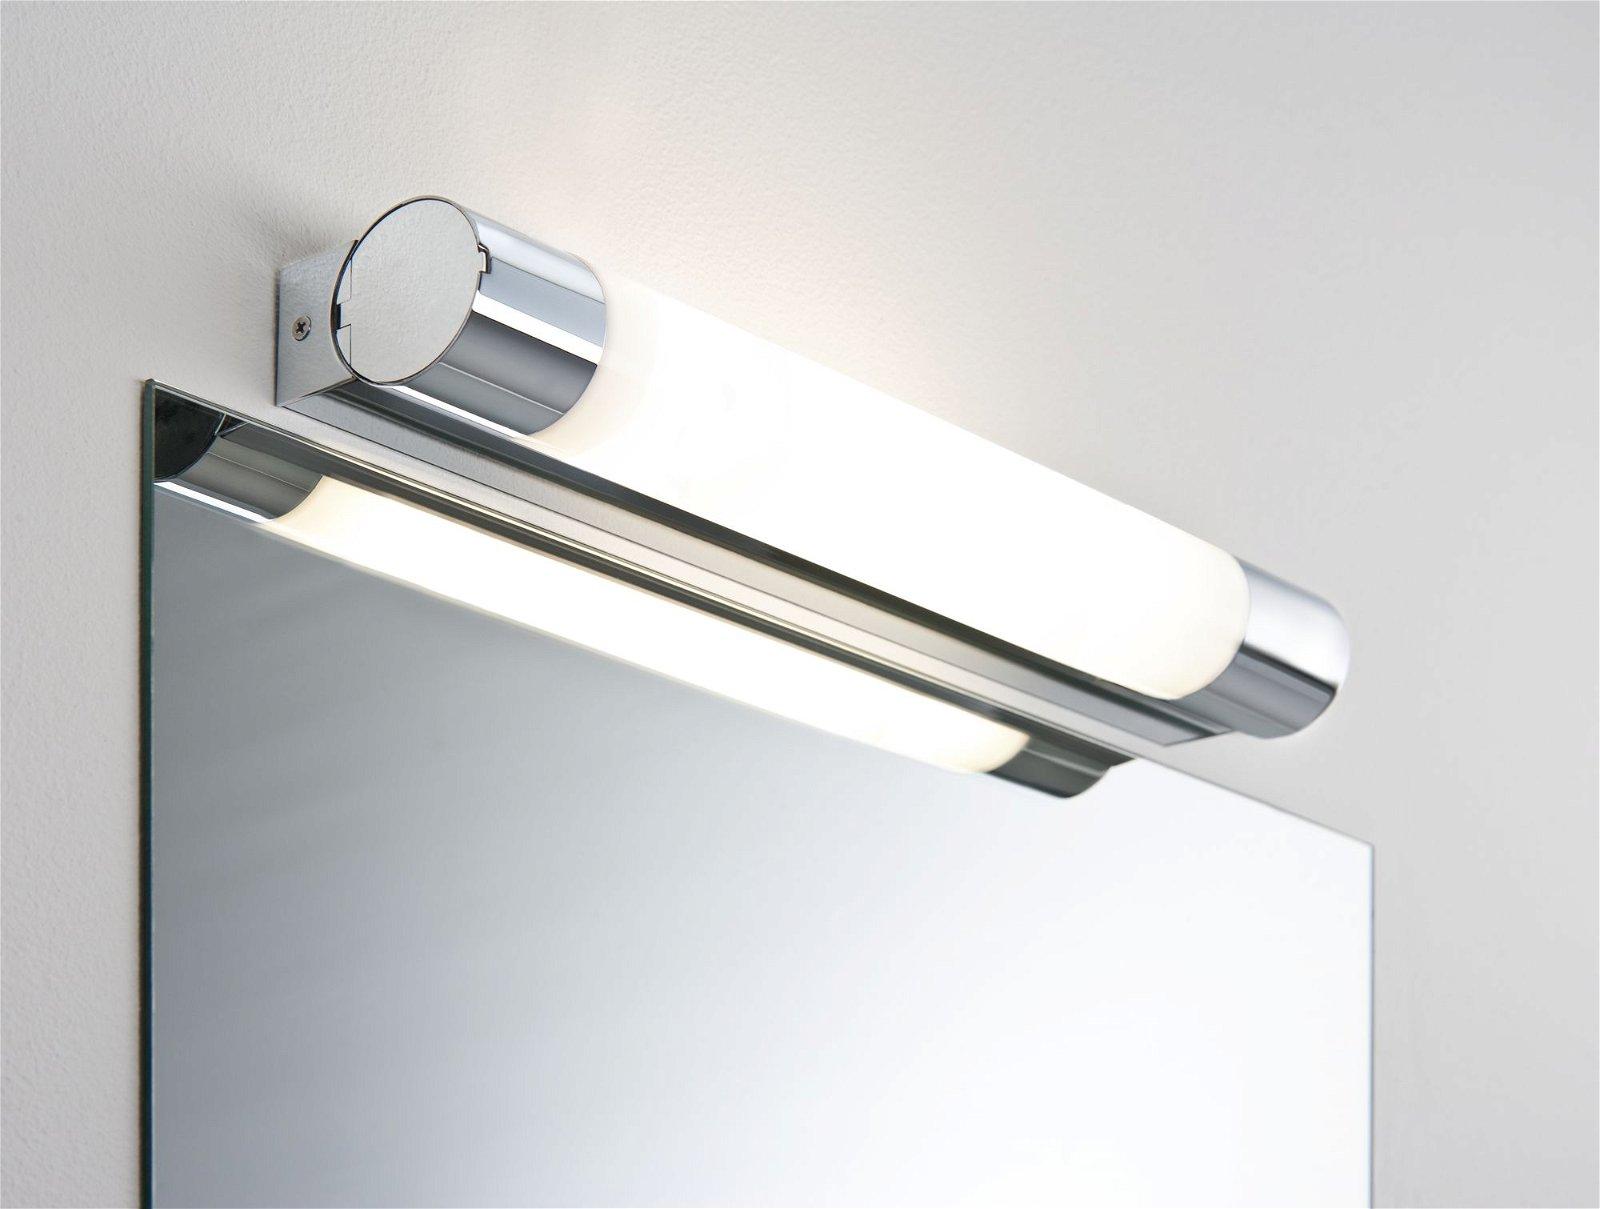 LED Spiegelleuchte Orgon Steckdose IP44 3000K 1400lm 230V 10,5W Chrom/Weiß